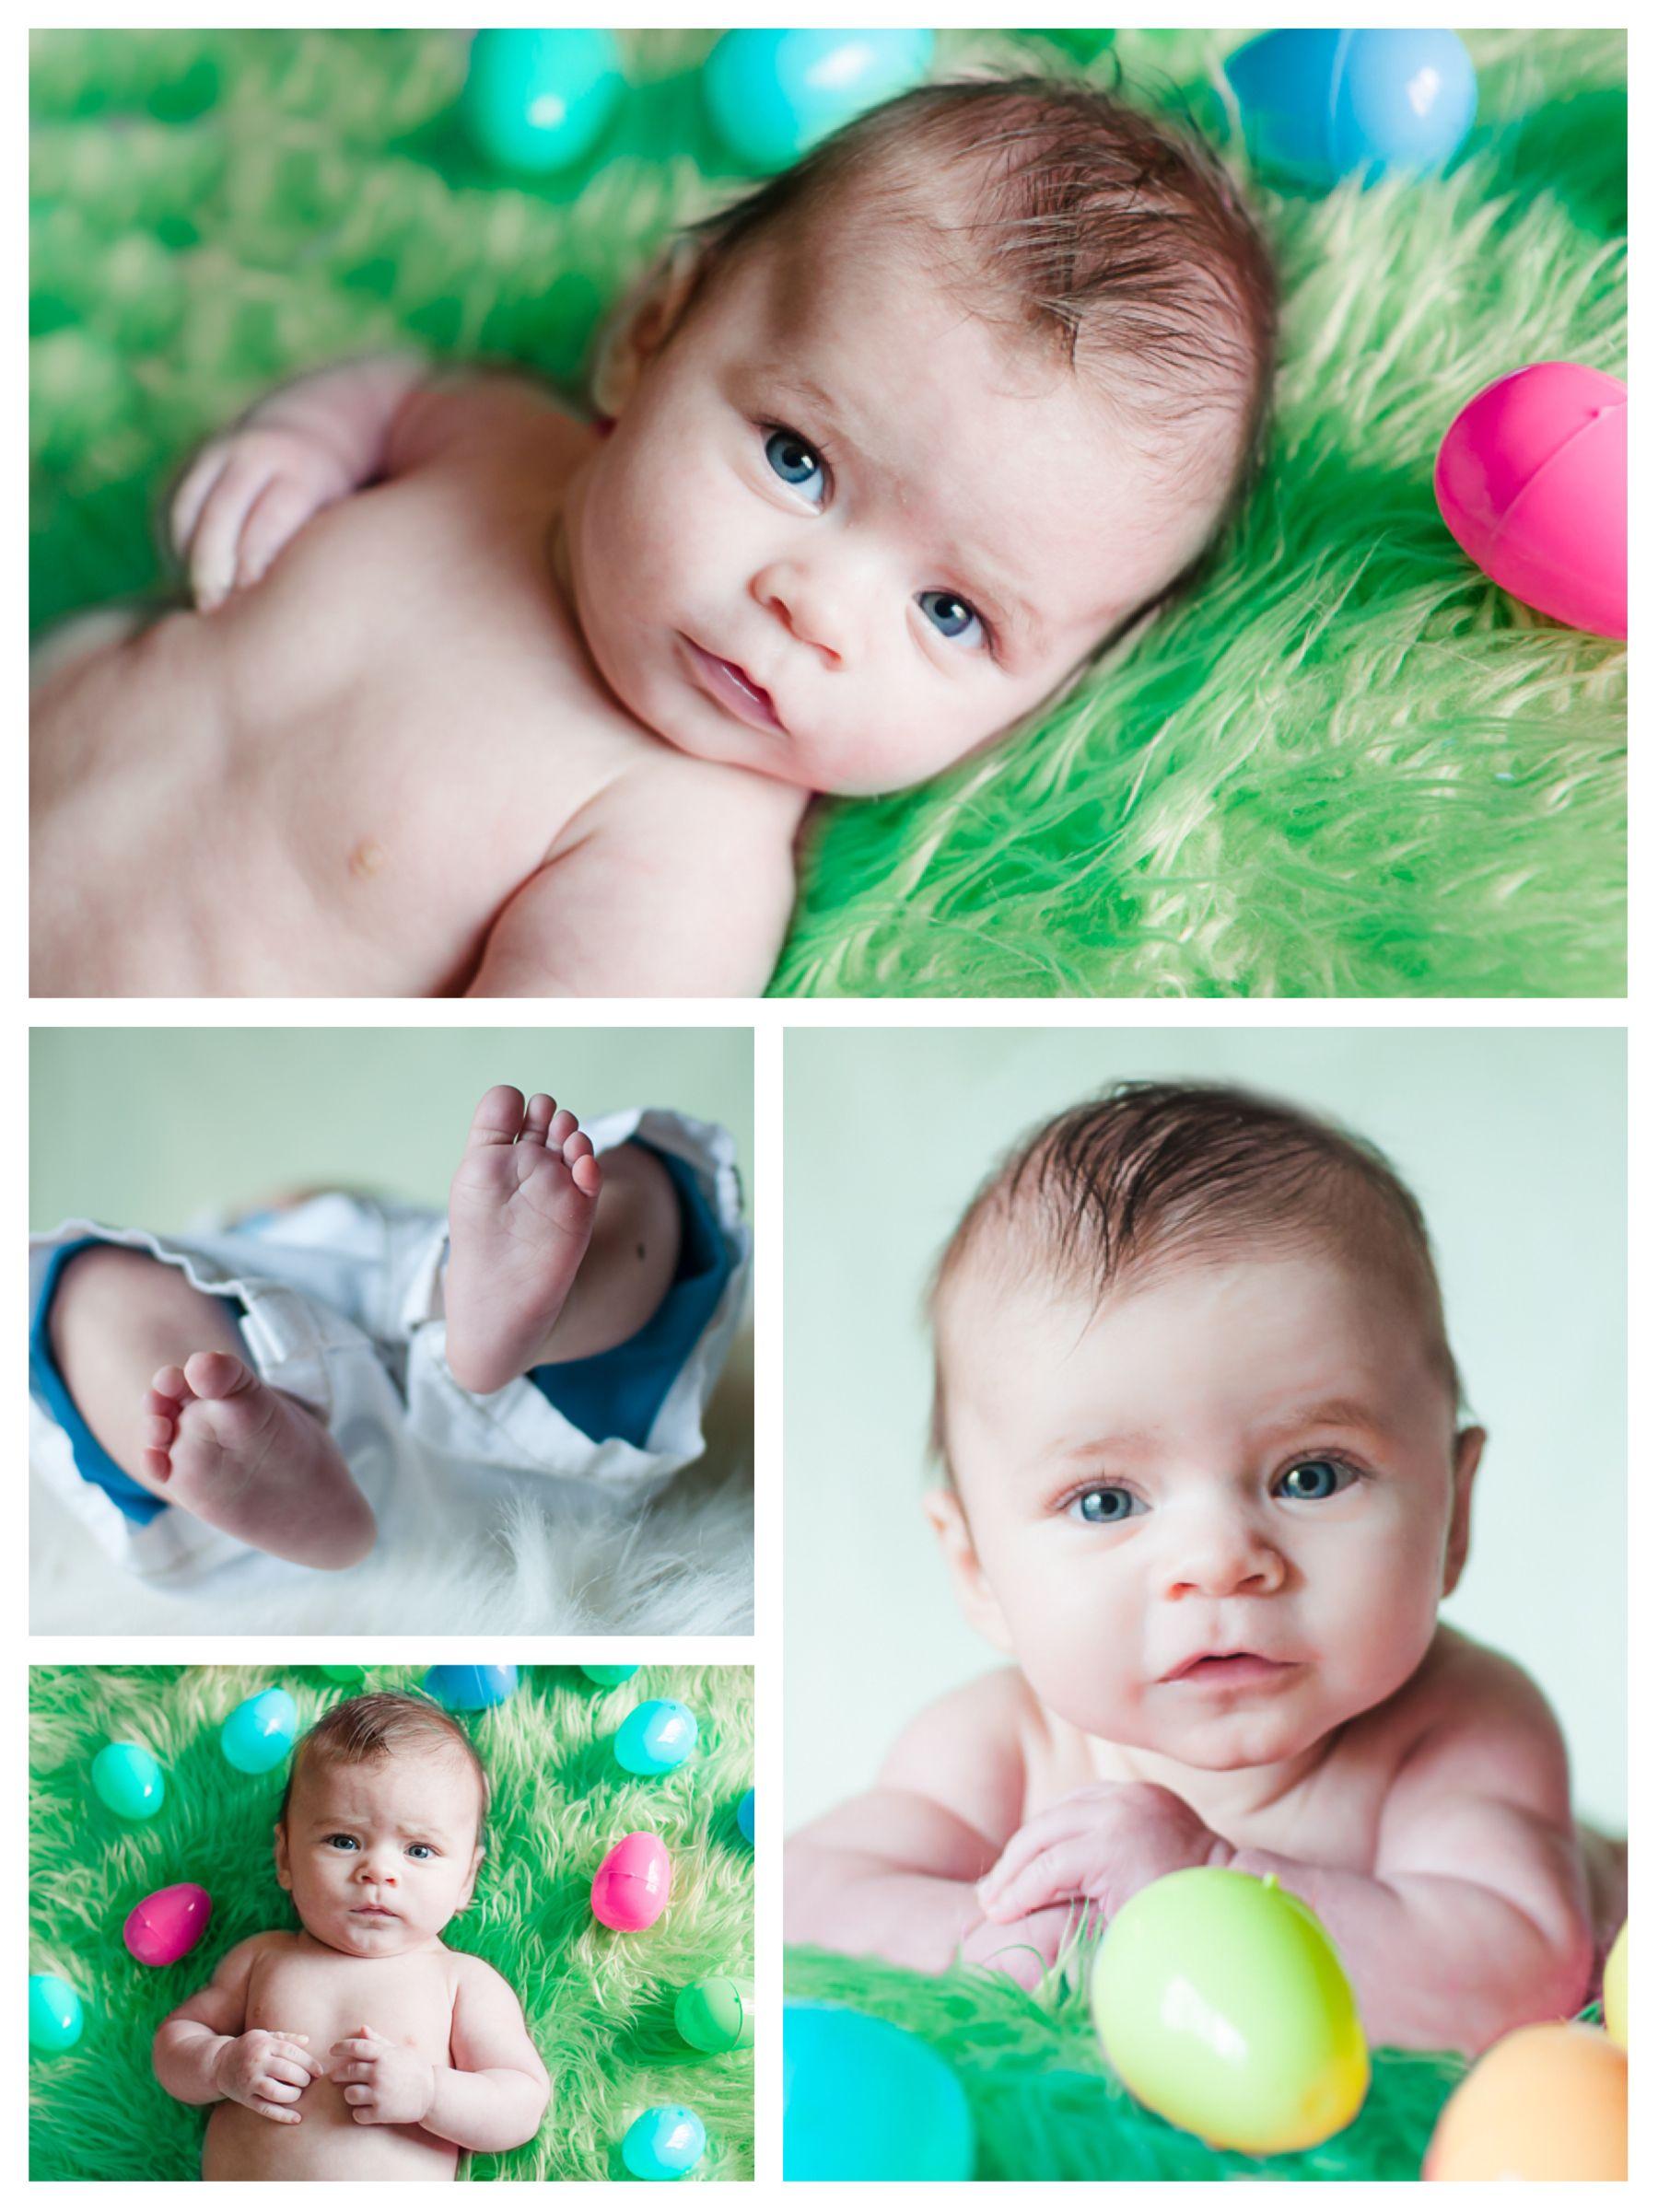 children u0027s easter photoshoot iliasis muniz photography children